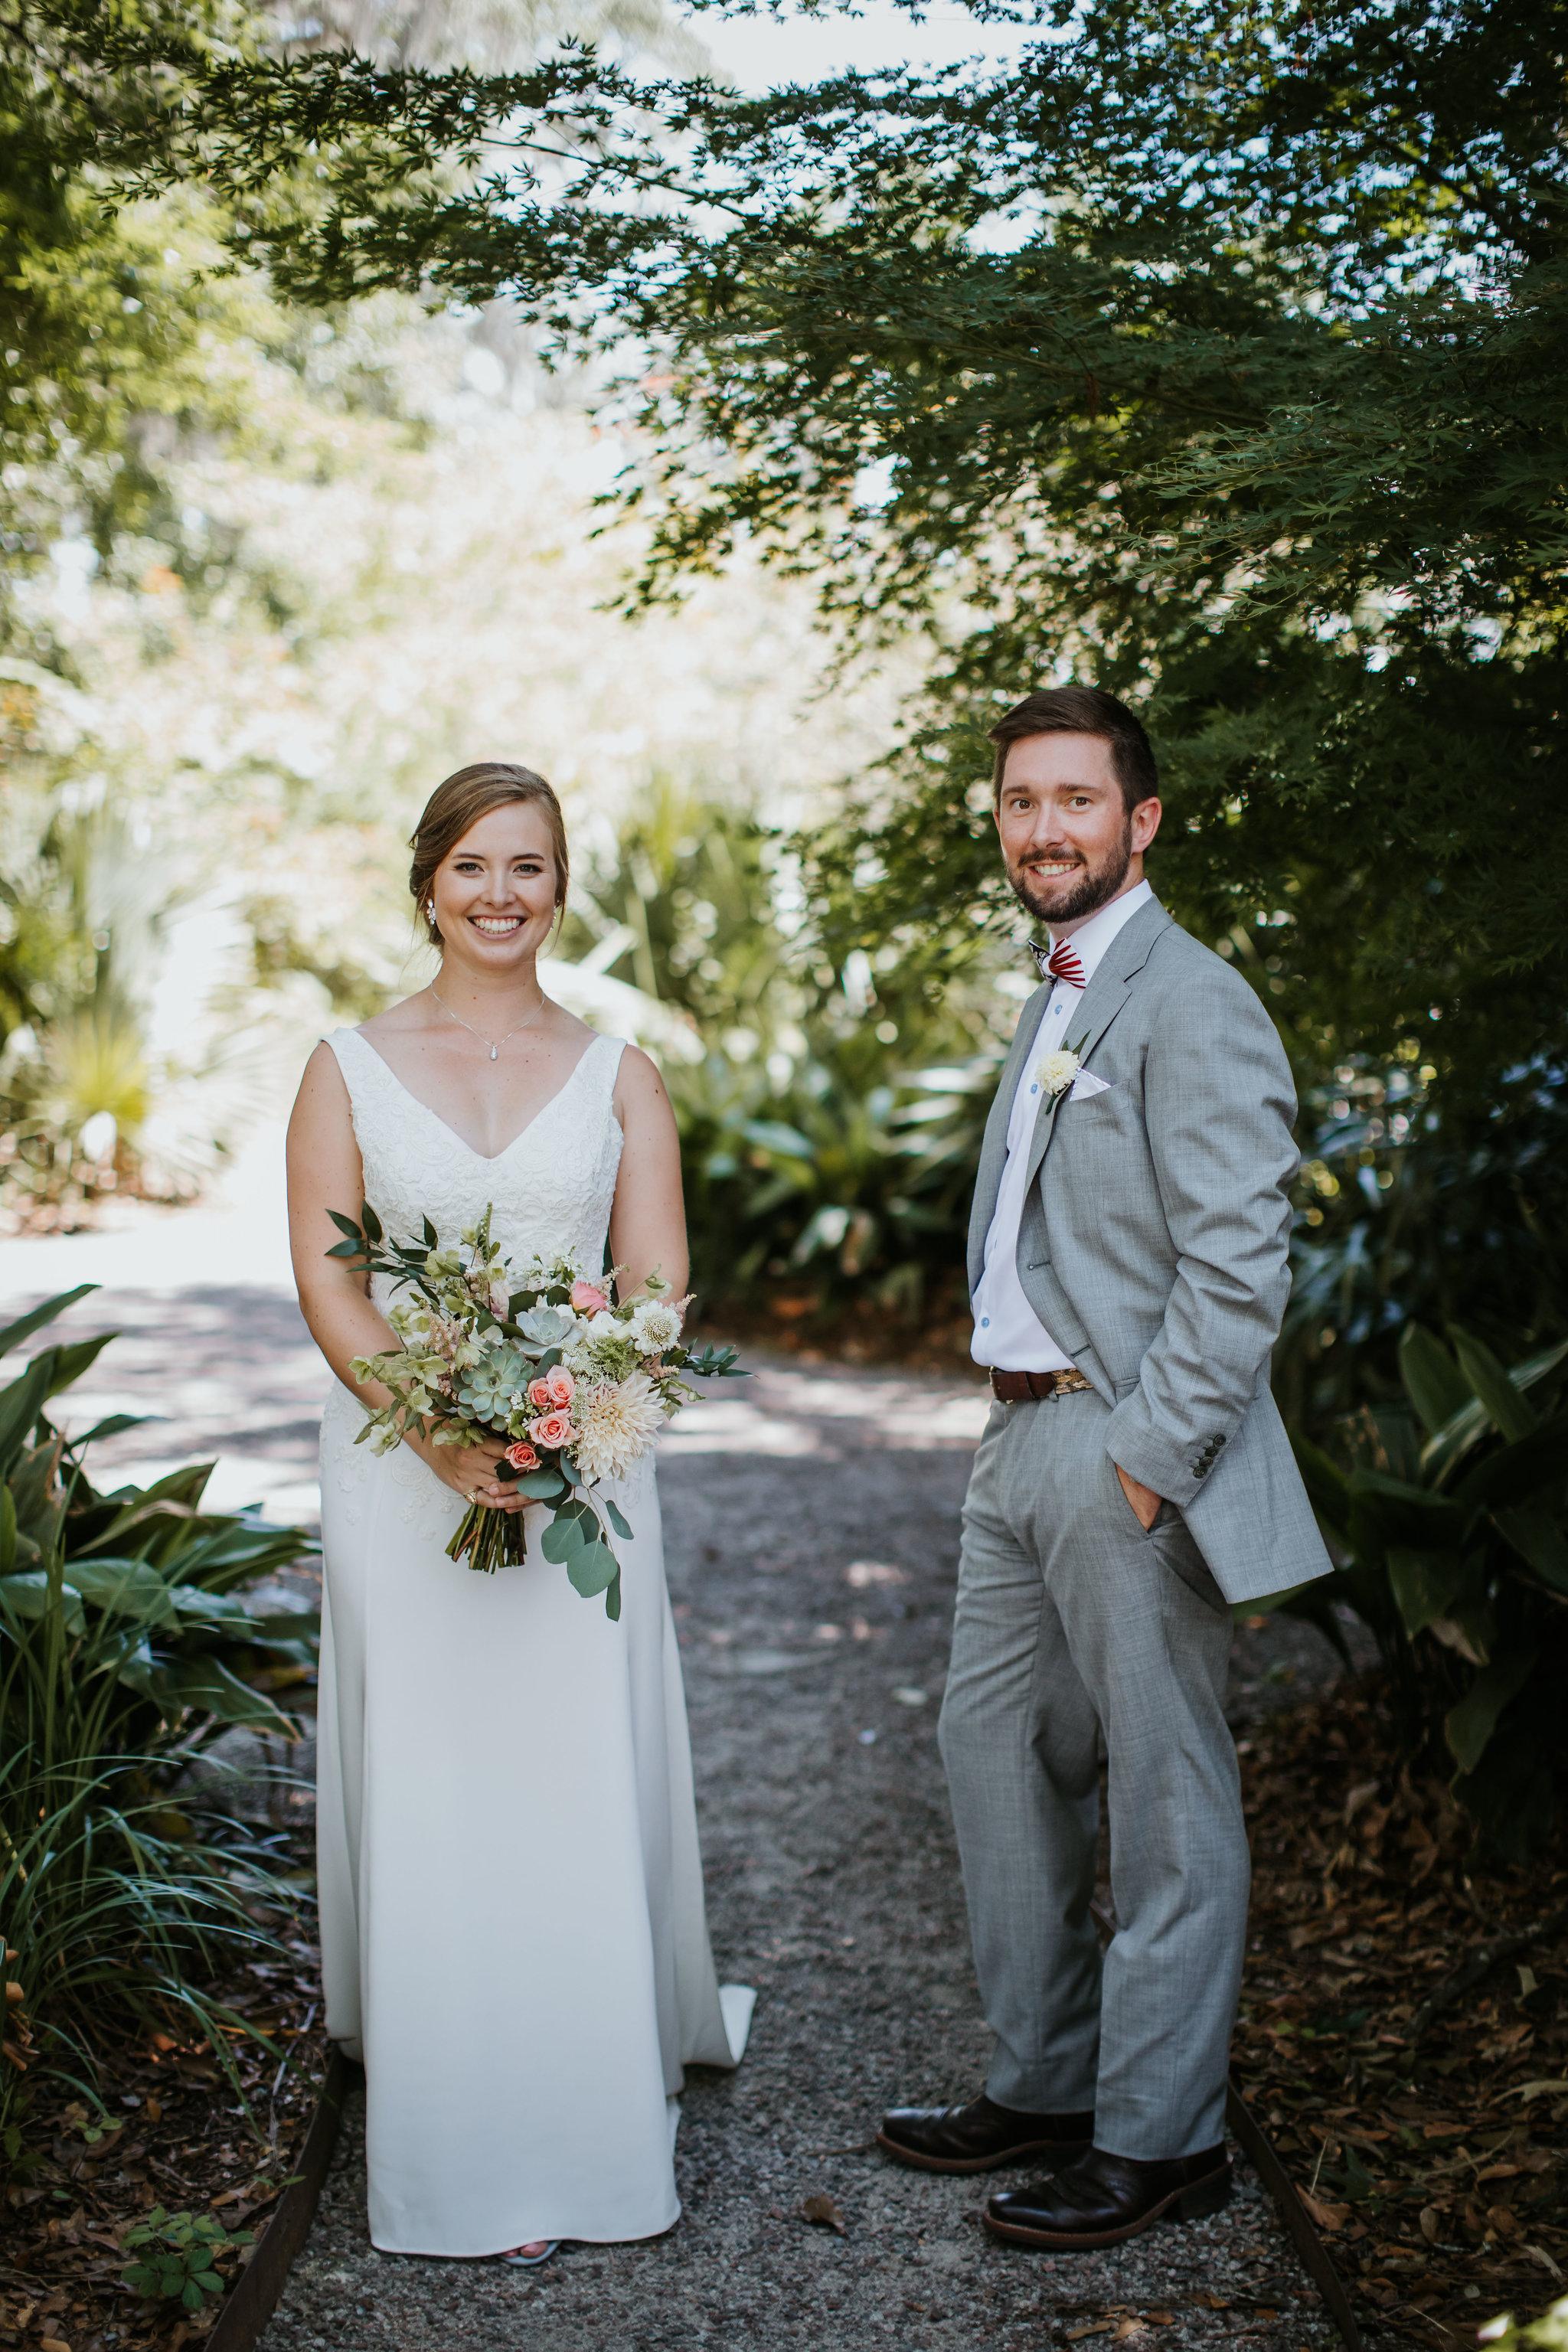 Creekclub-at-Ion-Charleston-SC-wedding-portrait-photographer-294.jpg